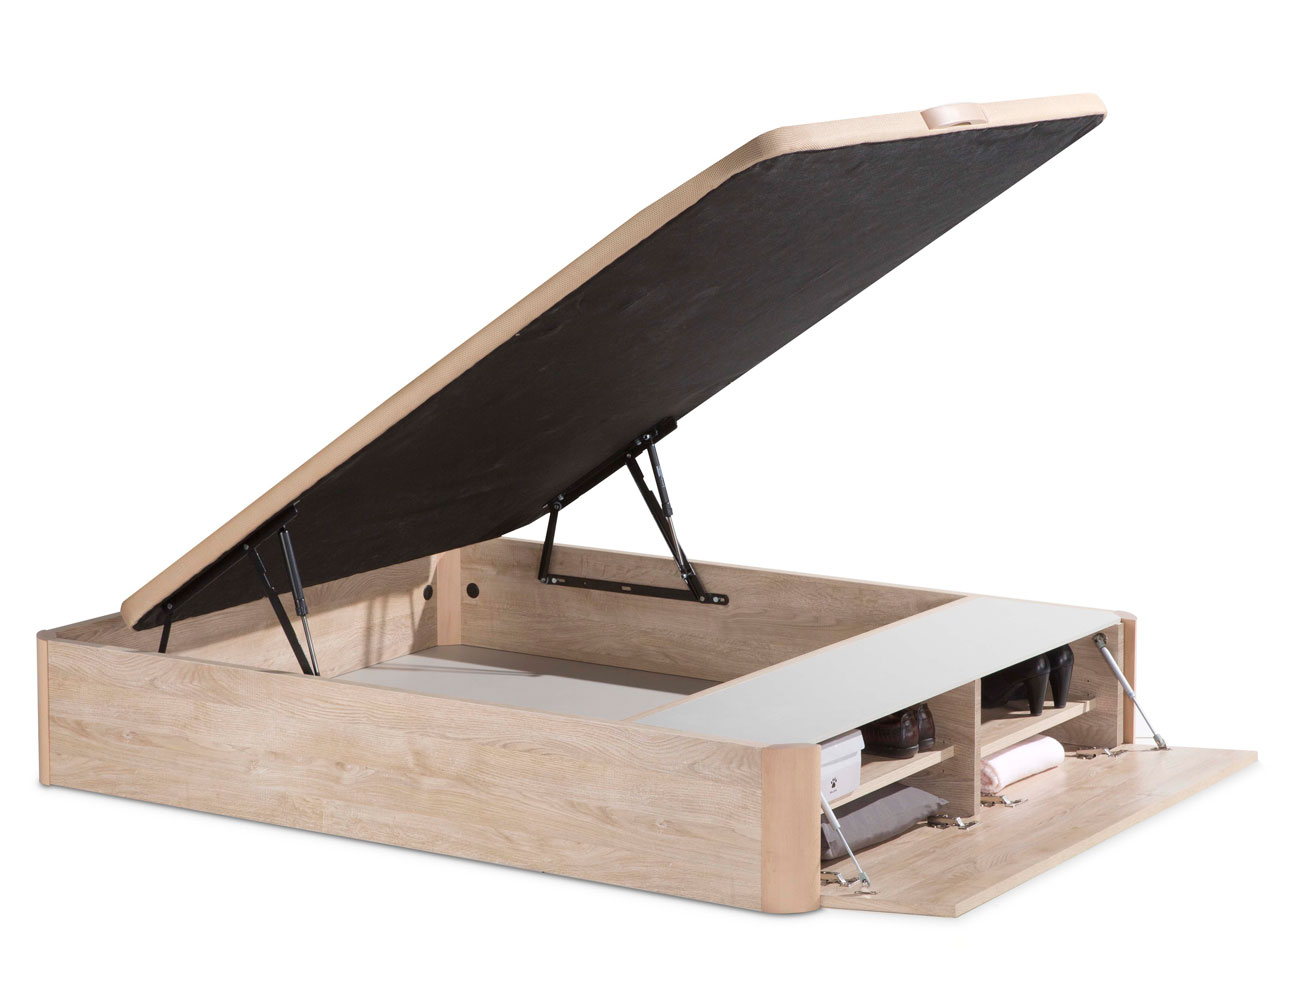 Canape zapatero madera tapa 3d 767